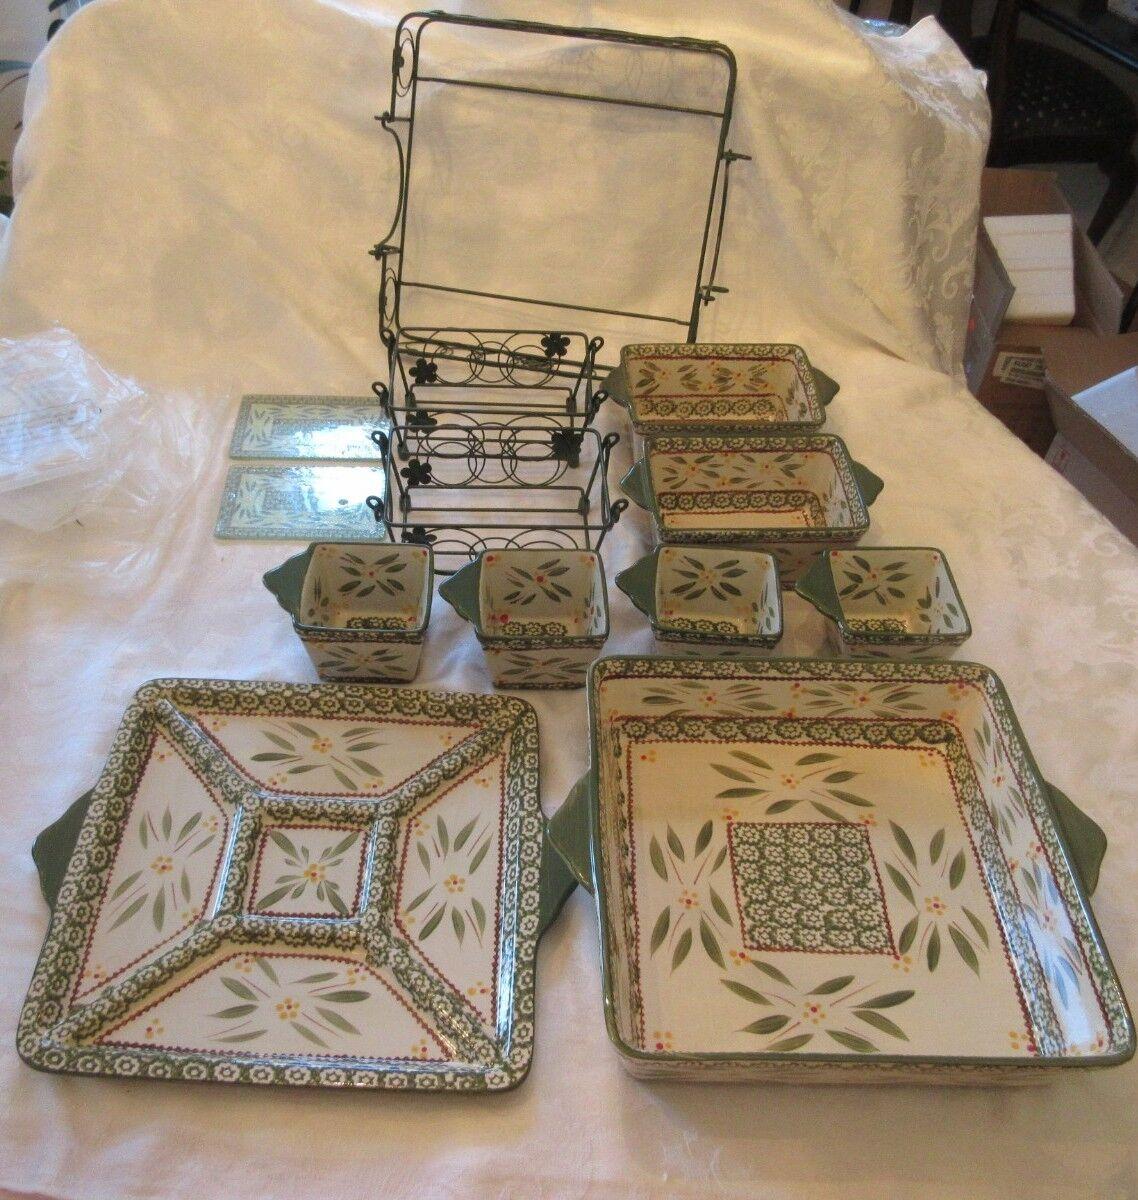 Temp-tation Old World Grün Oven to Table 13 Piece Set